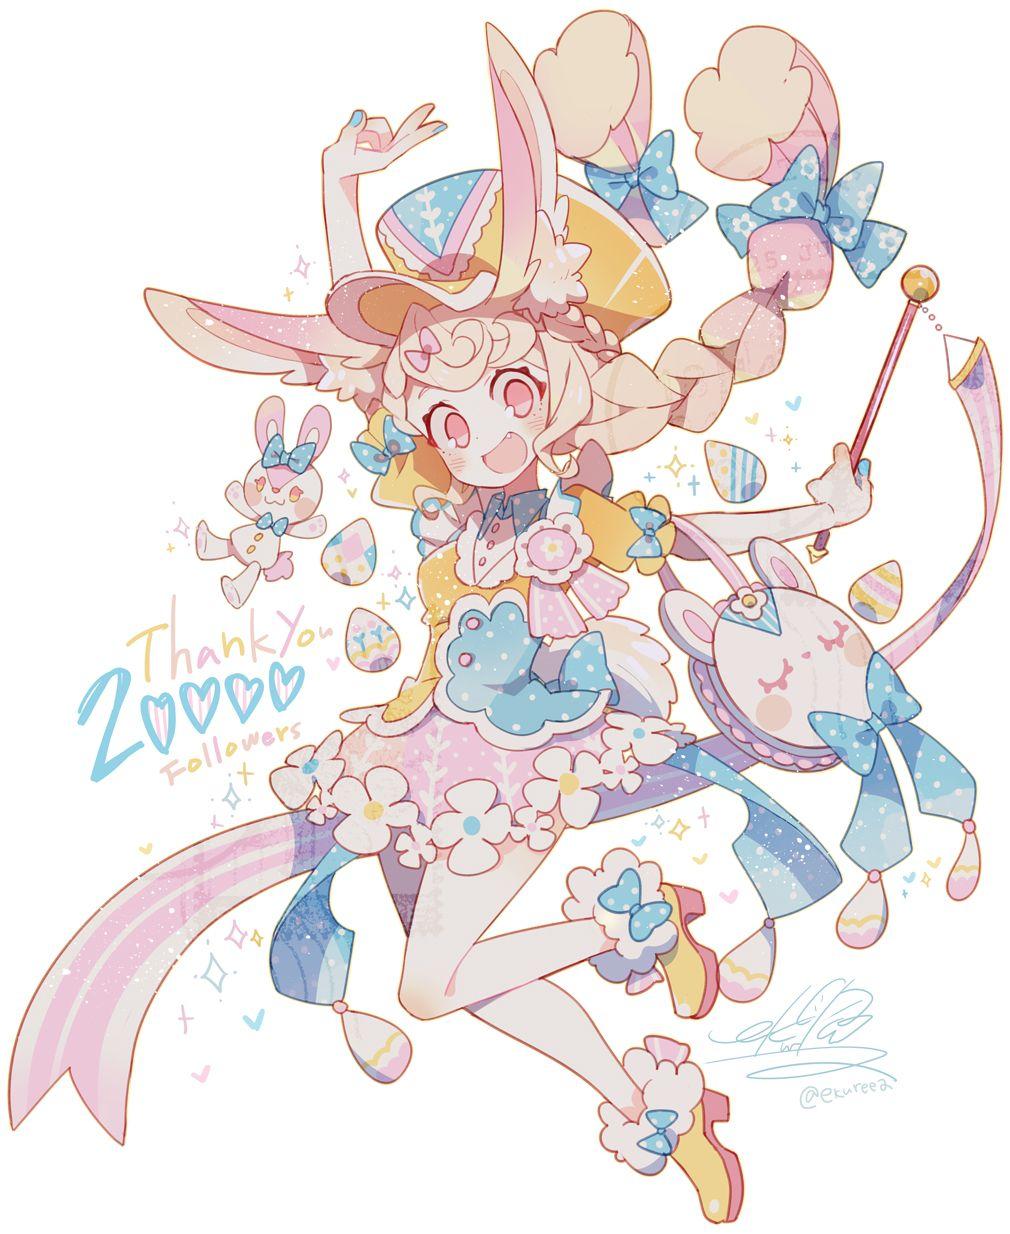 Dessin de petite fille manga en couleur dessin de manga - Fille en manga ...